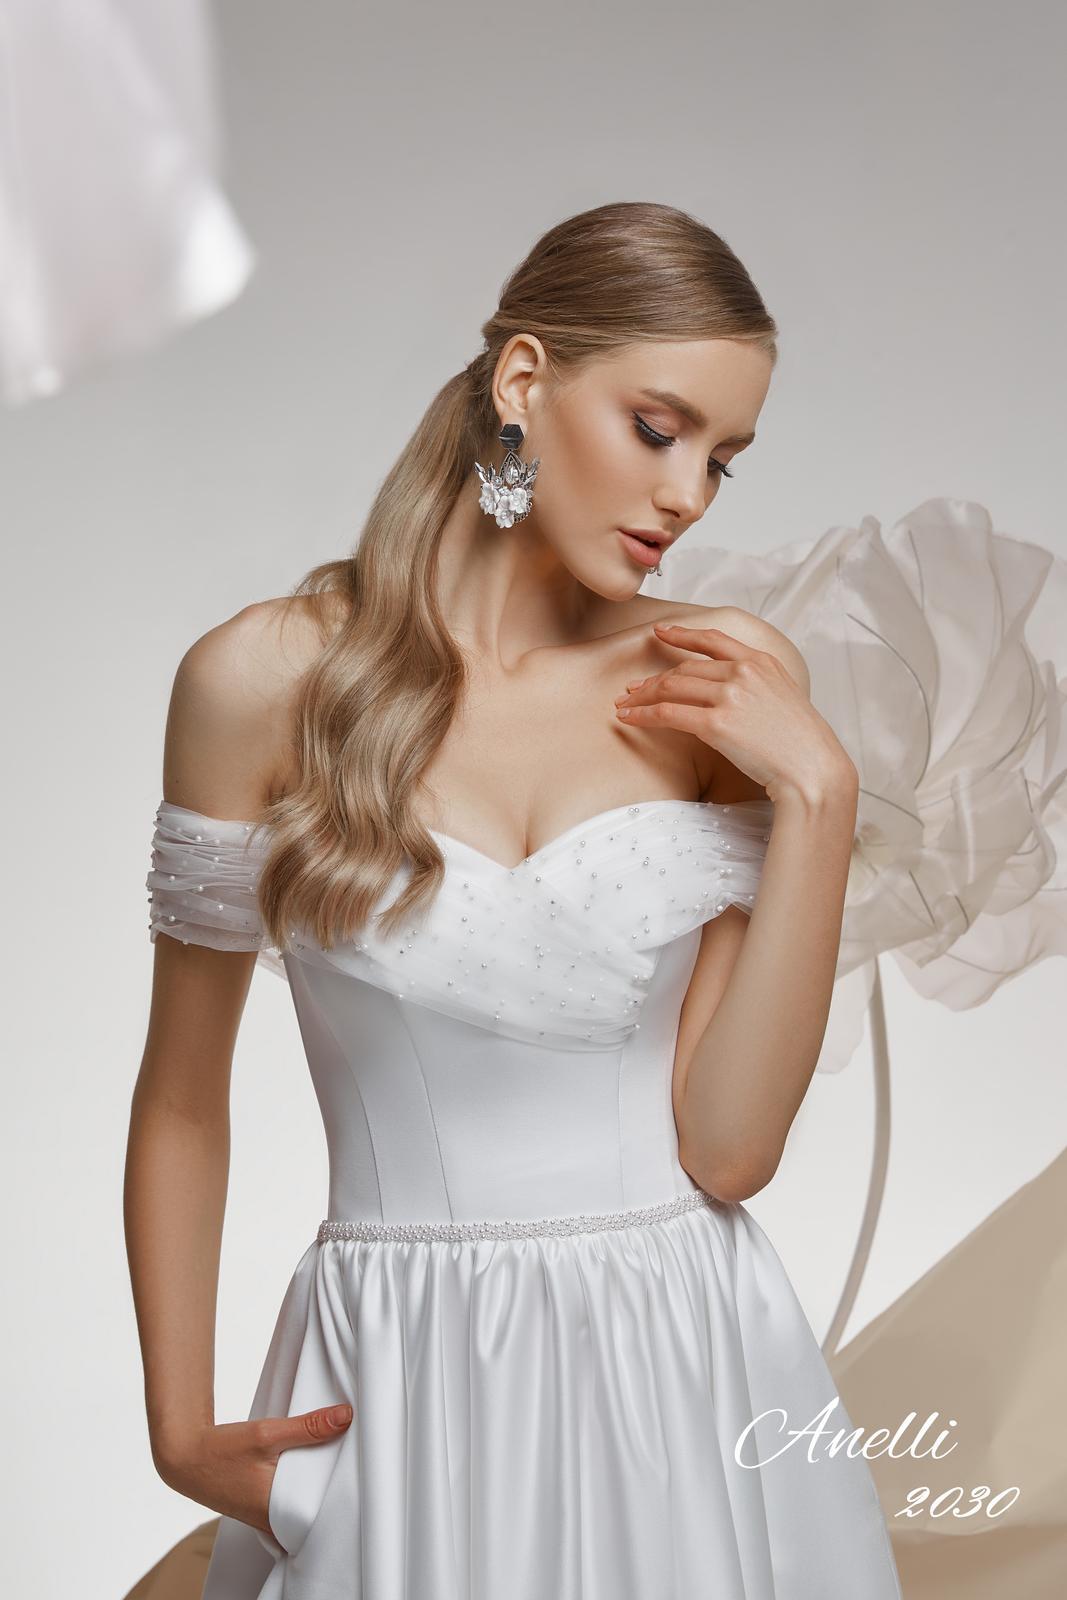 Svadobné šaty - Imagine 2030 - Obrázok č. 3